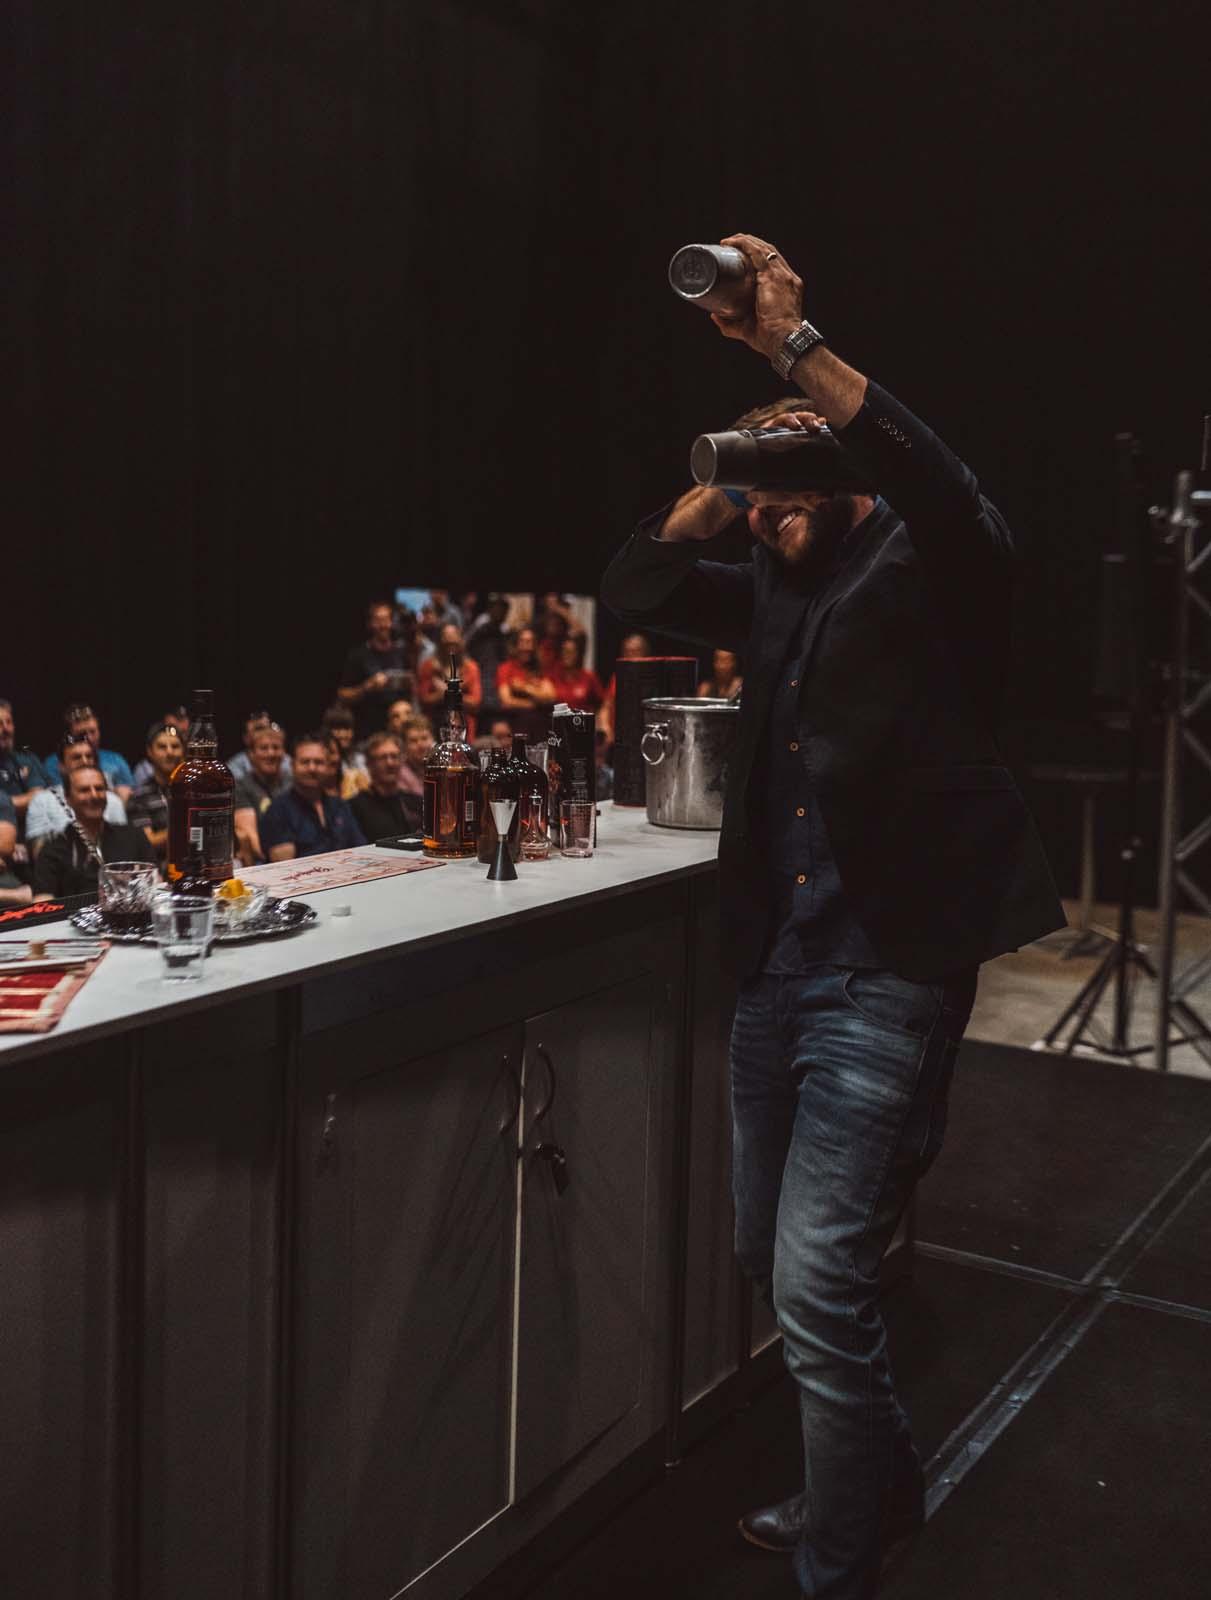 Dramfest 2018 for Whisky Galore-48.jpg